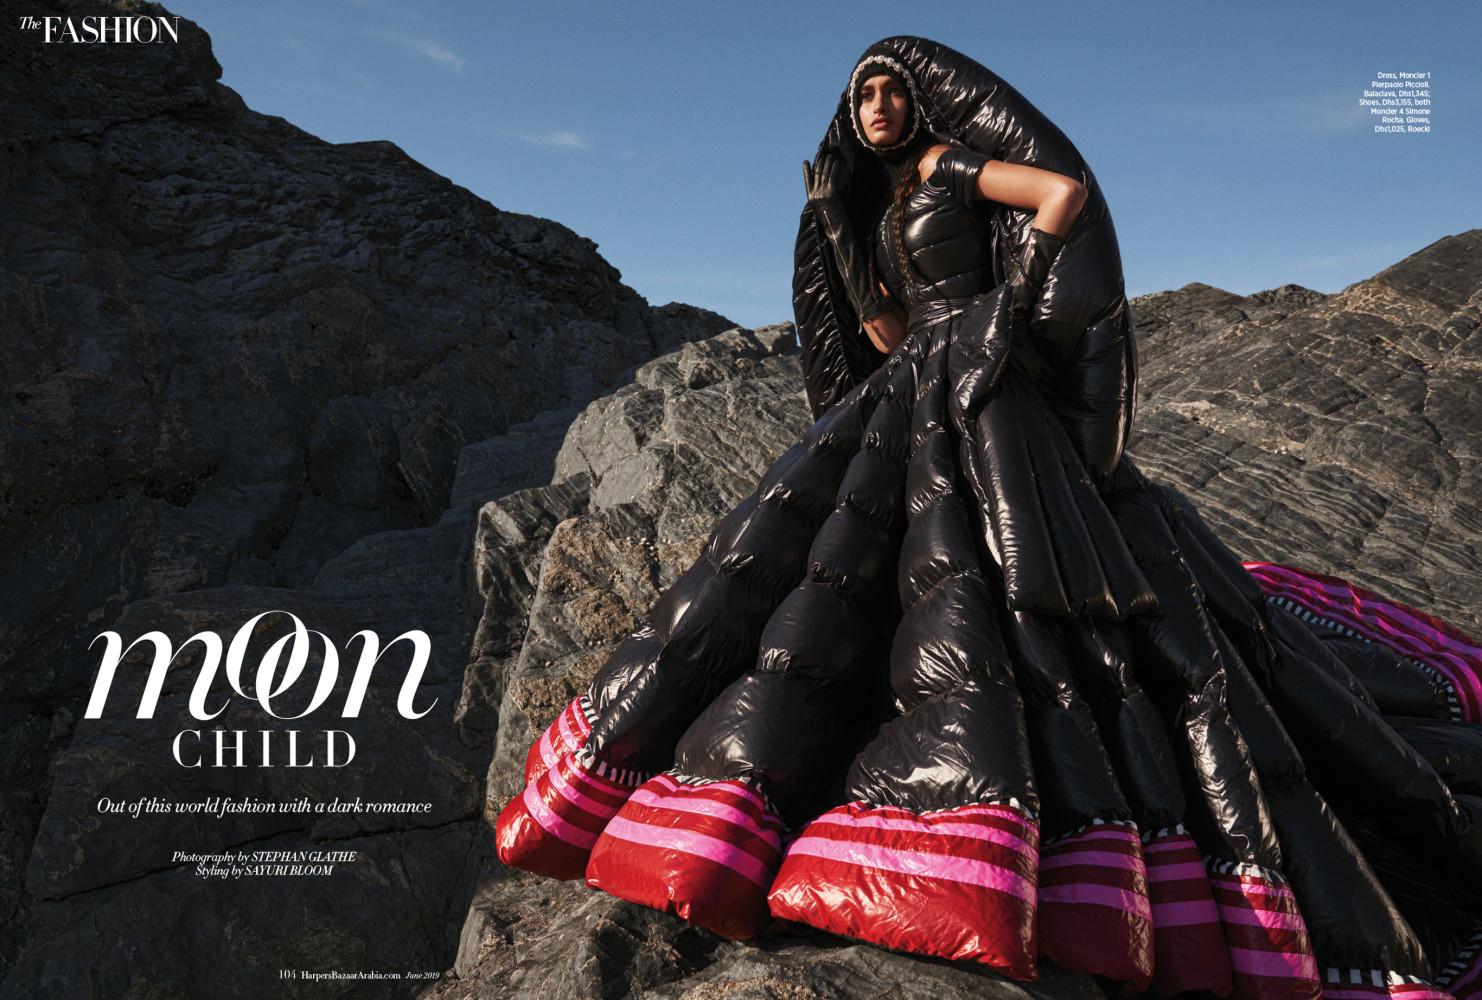 GIZELE OLIVEIRA for Harper´s Bazaar Arabia by Stephan Glathe